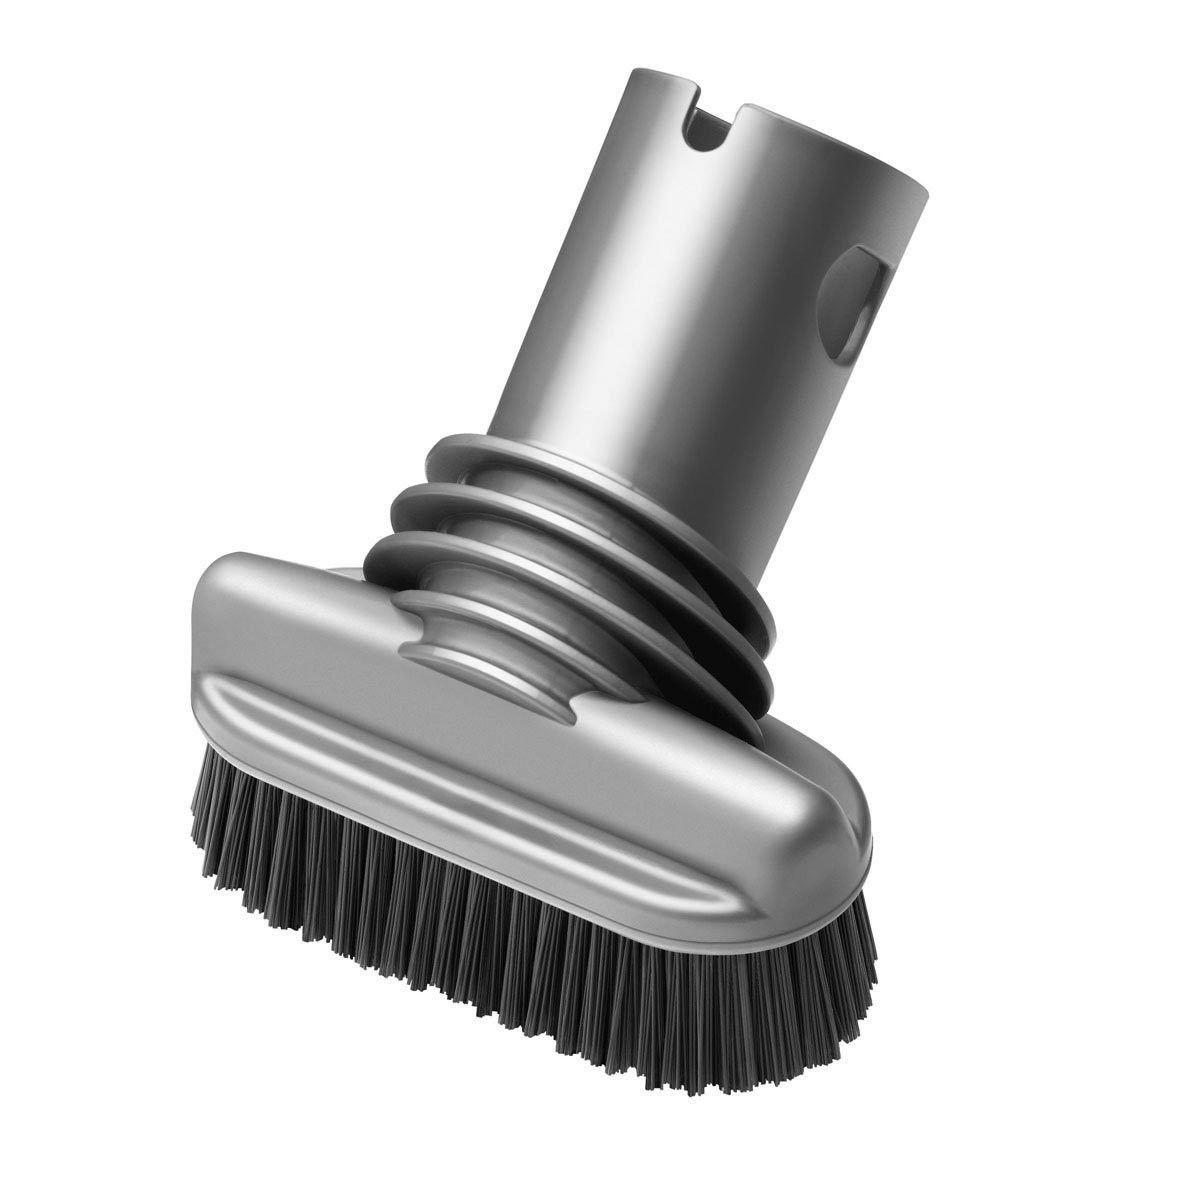 Dyson Stiff Bristle Brush Vacuum cleaner brands, Dyson